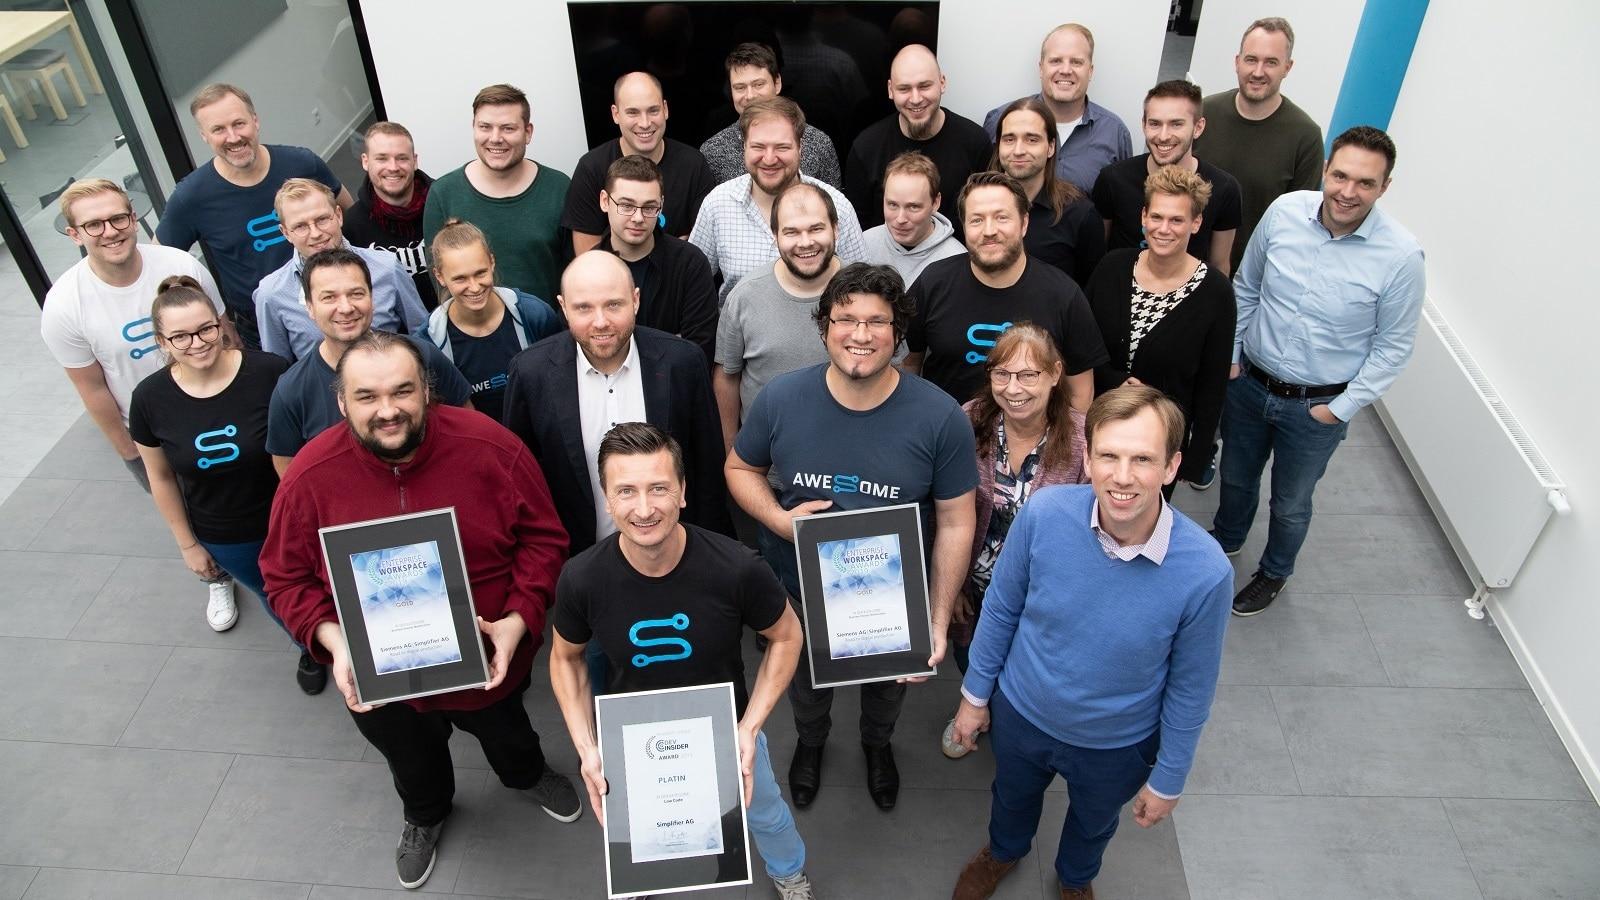 Simplifier AG | Platin Vogel IT Awards